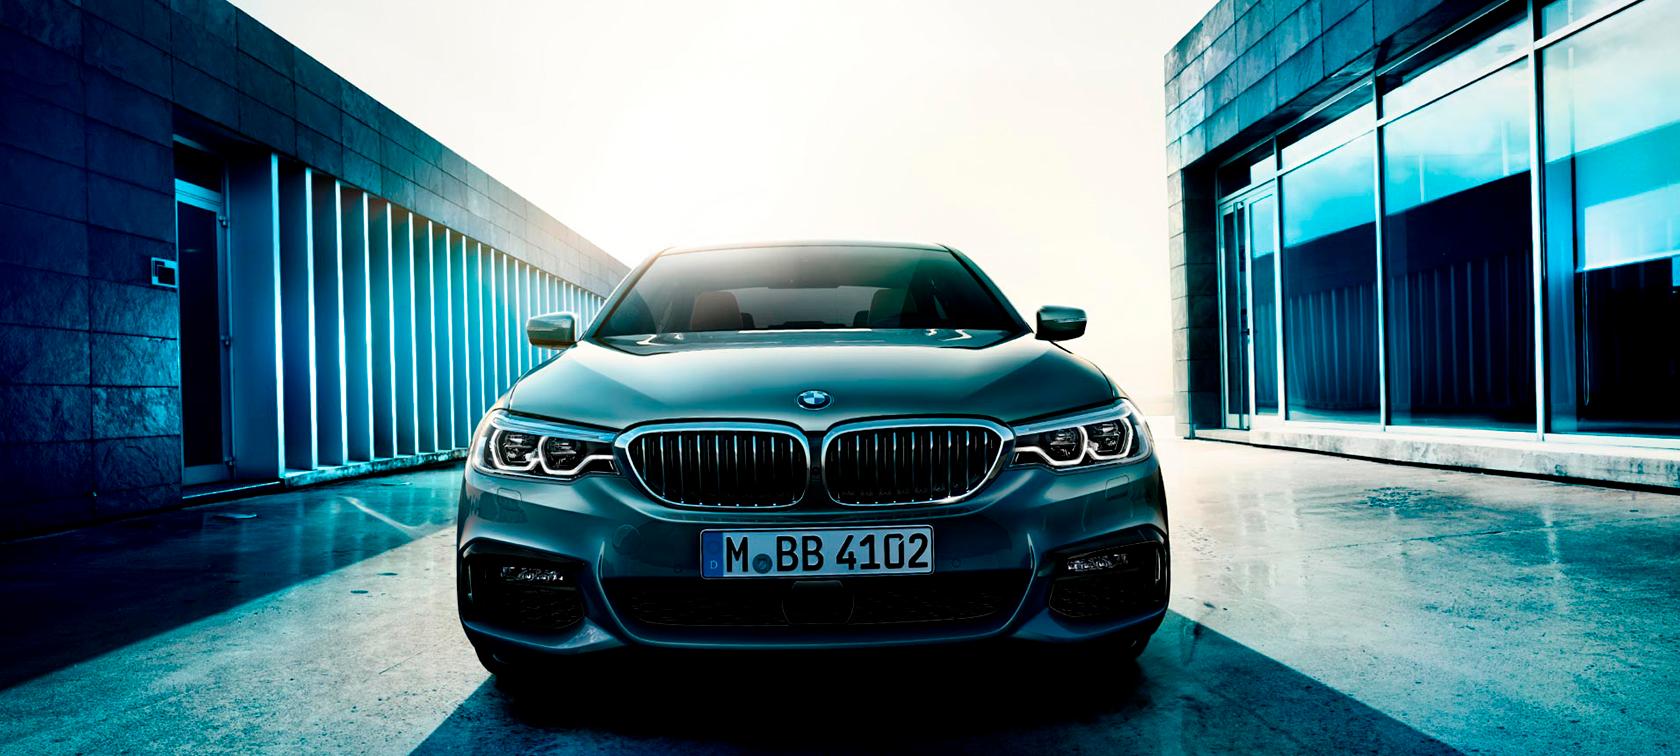 Bikar Motor, Servicio Oficial BMW en Bizkaia